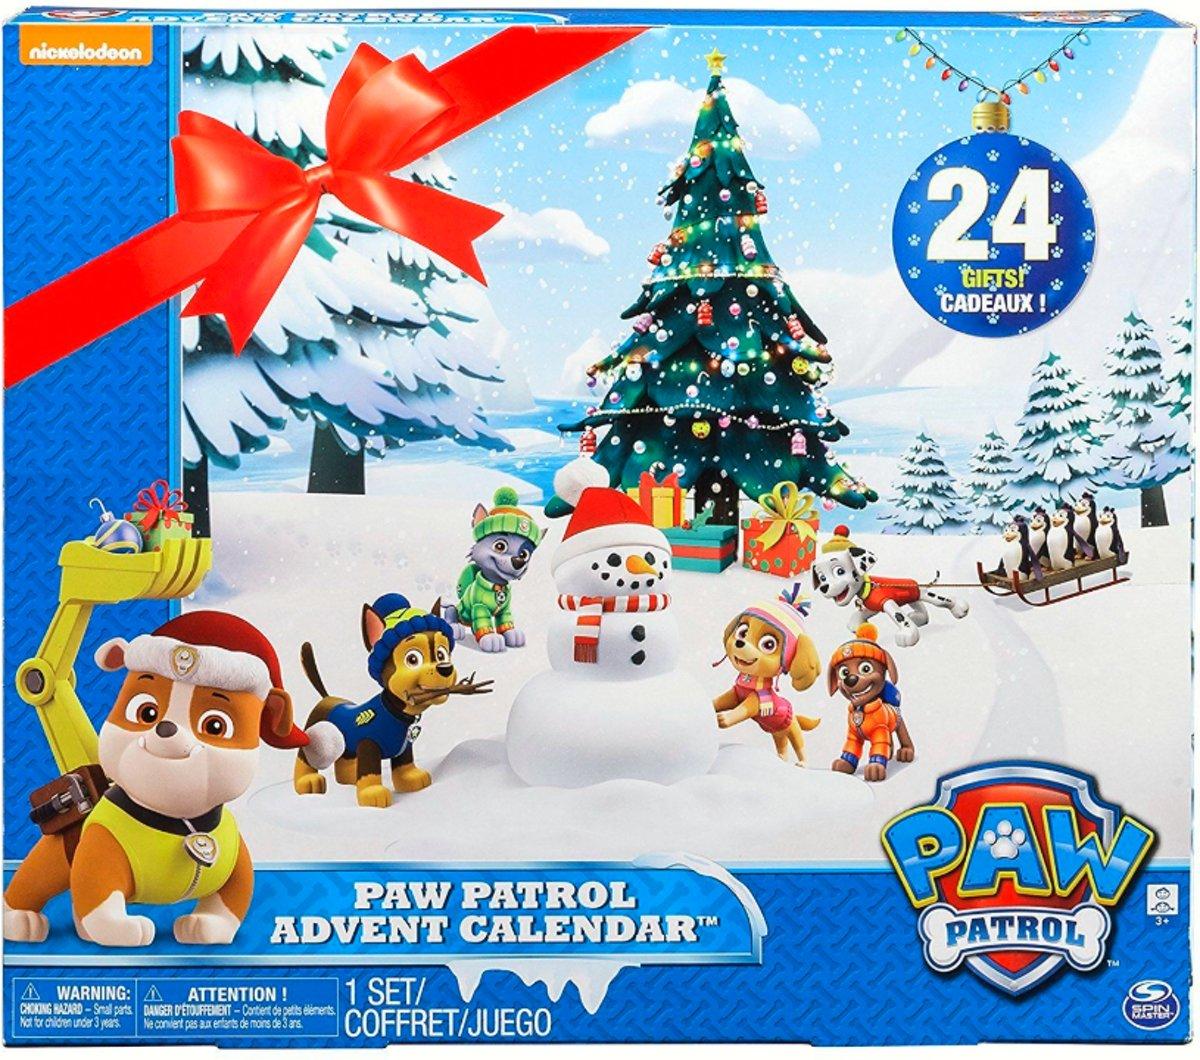 Nickelodeon Paw Patrol Adventskalender met echte poppetjes kopen